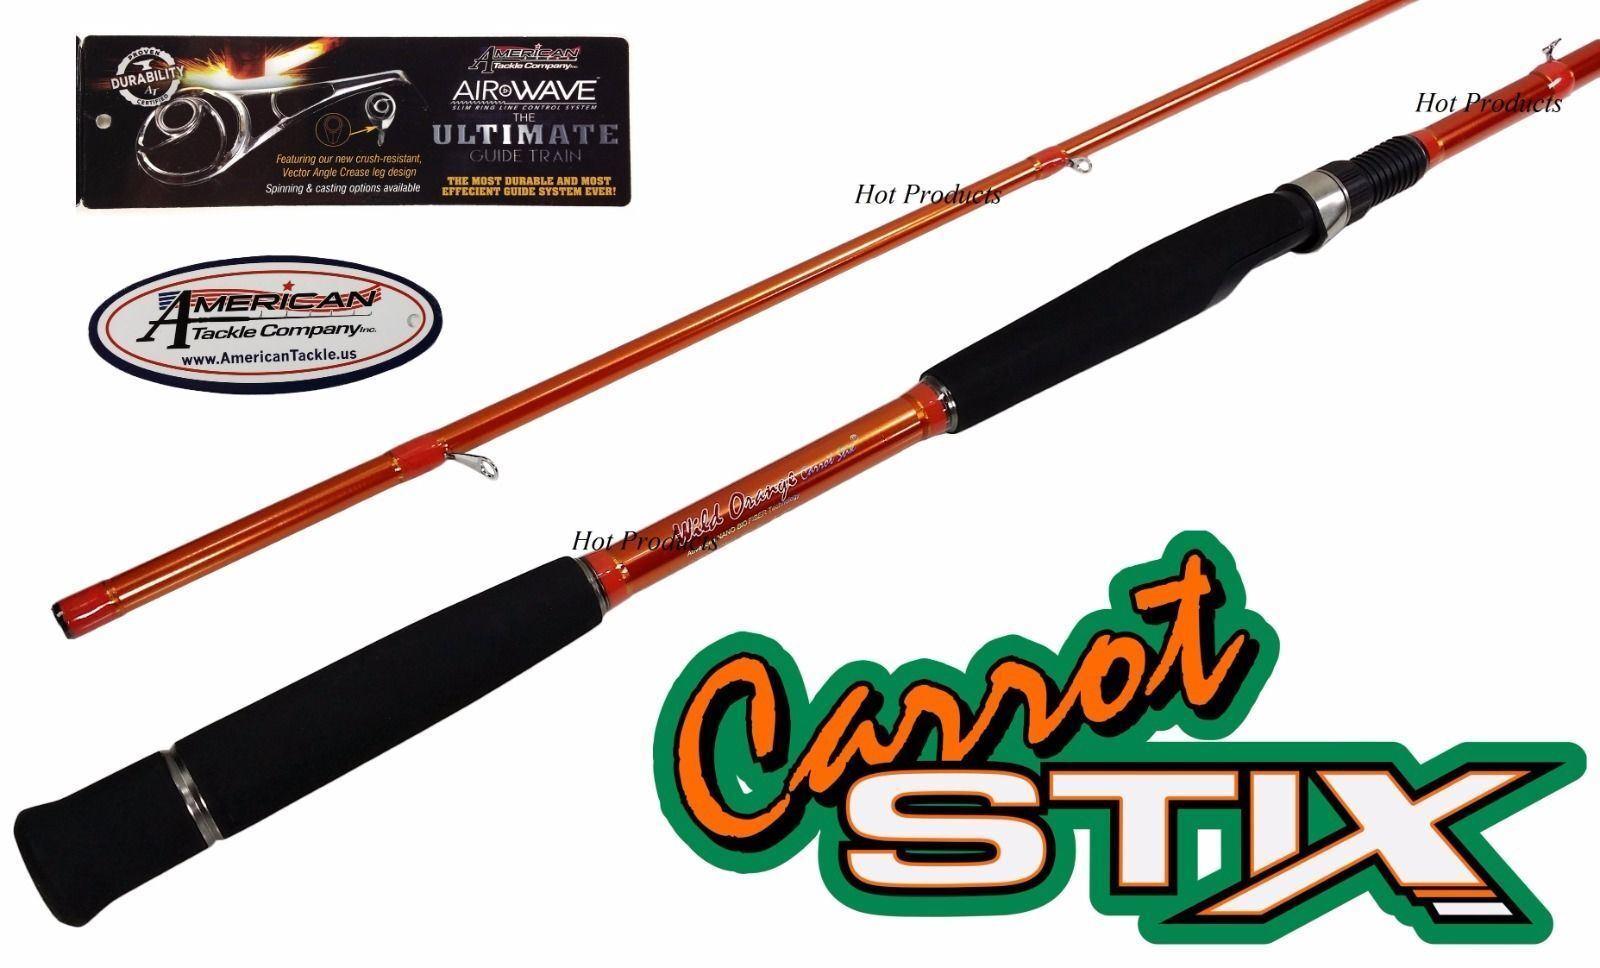 Carred Stix SPINNING 9' MEDIUM HEAVY WILD orange Salmon Steelhead Fishing Rod